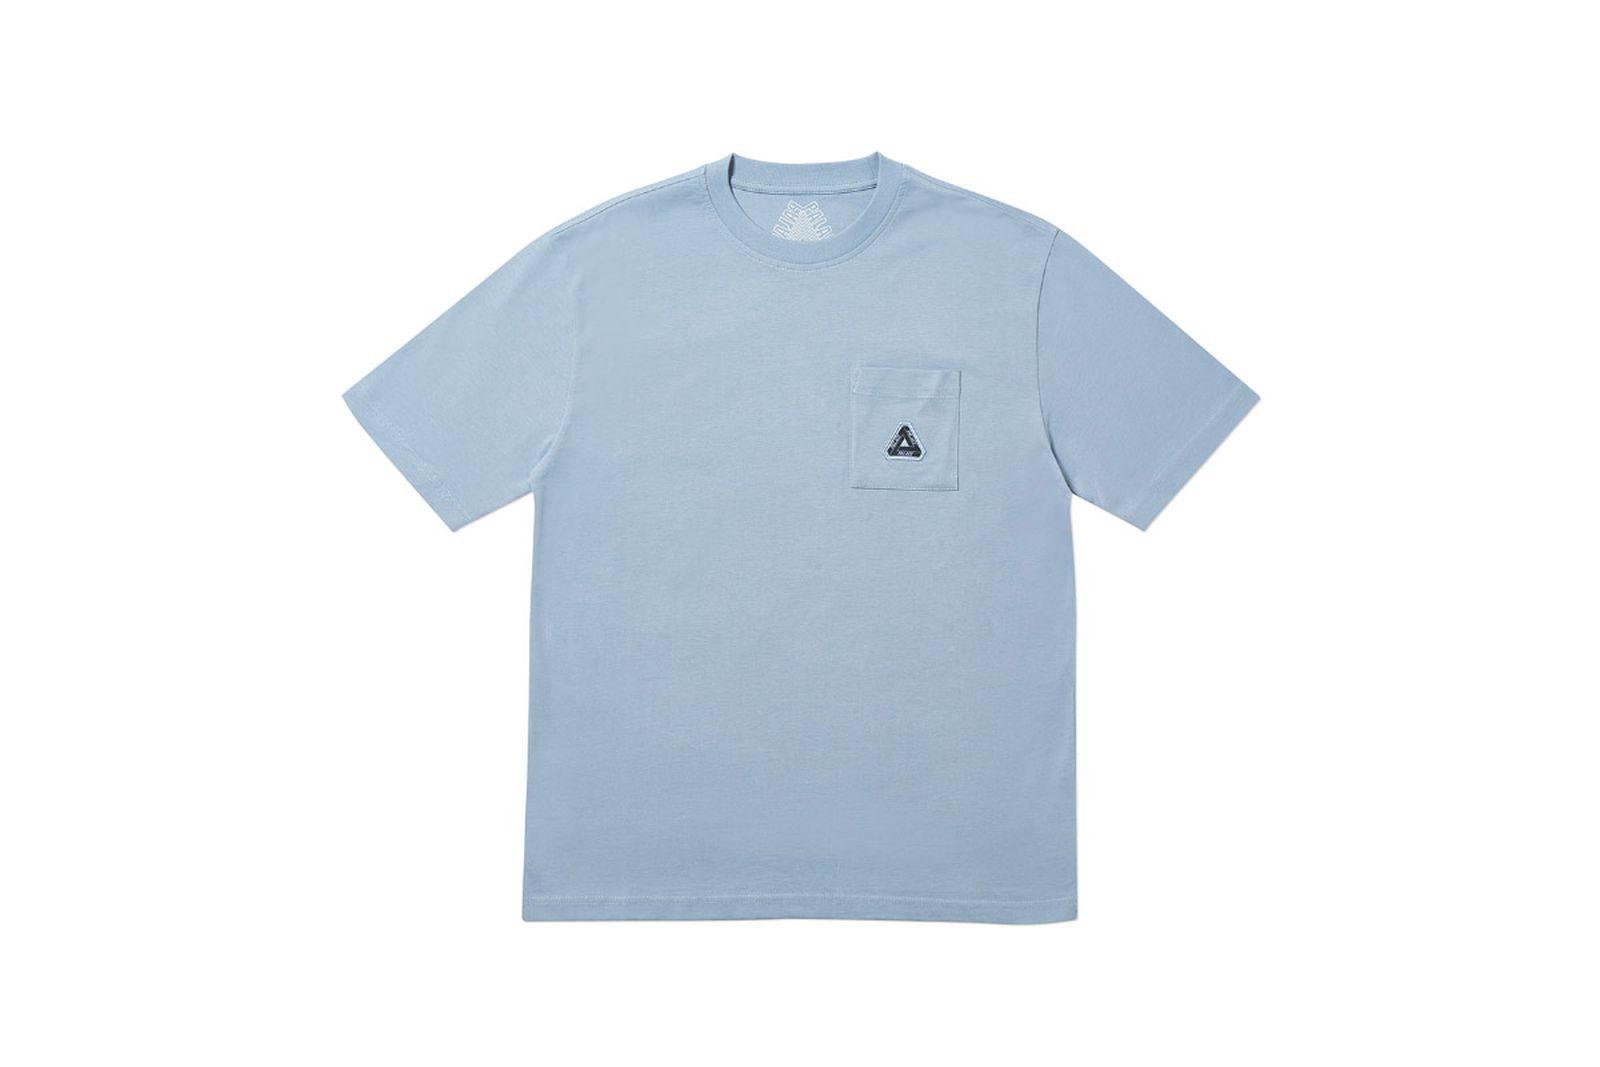 Palace 2019 Autumn T Shirt Pocket T mid blue